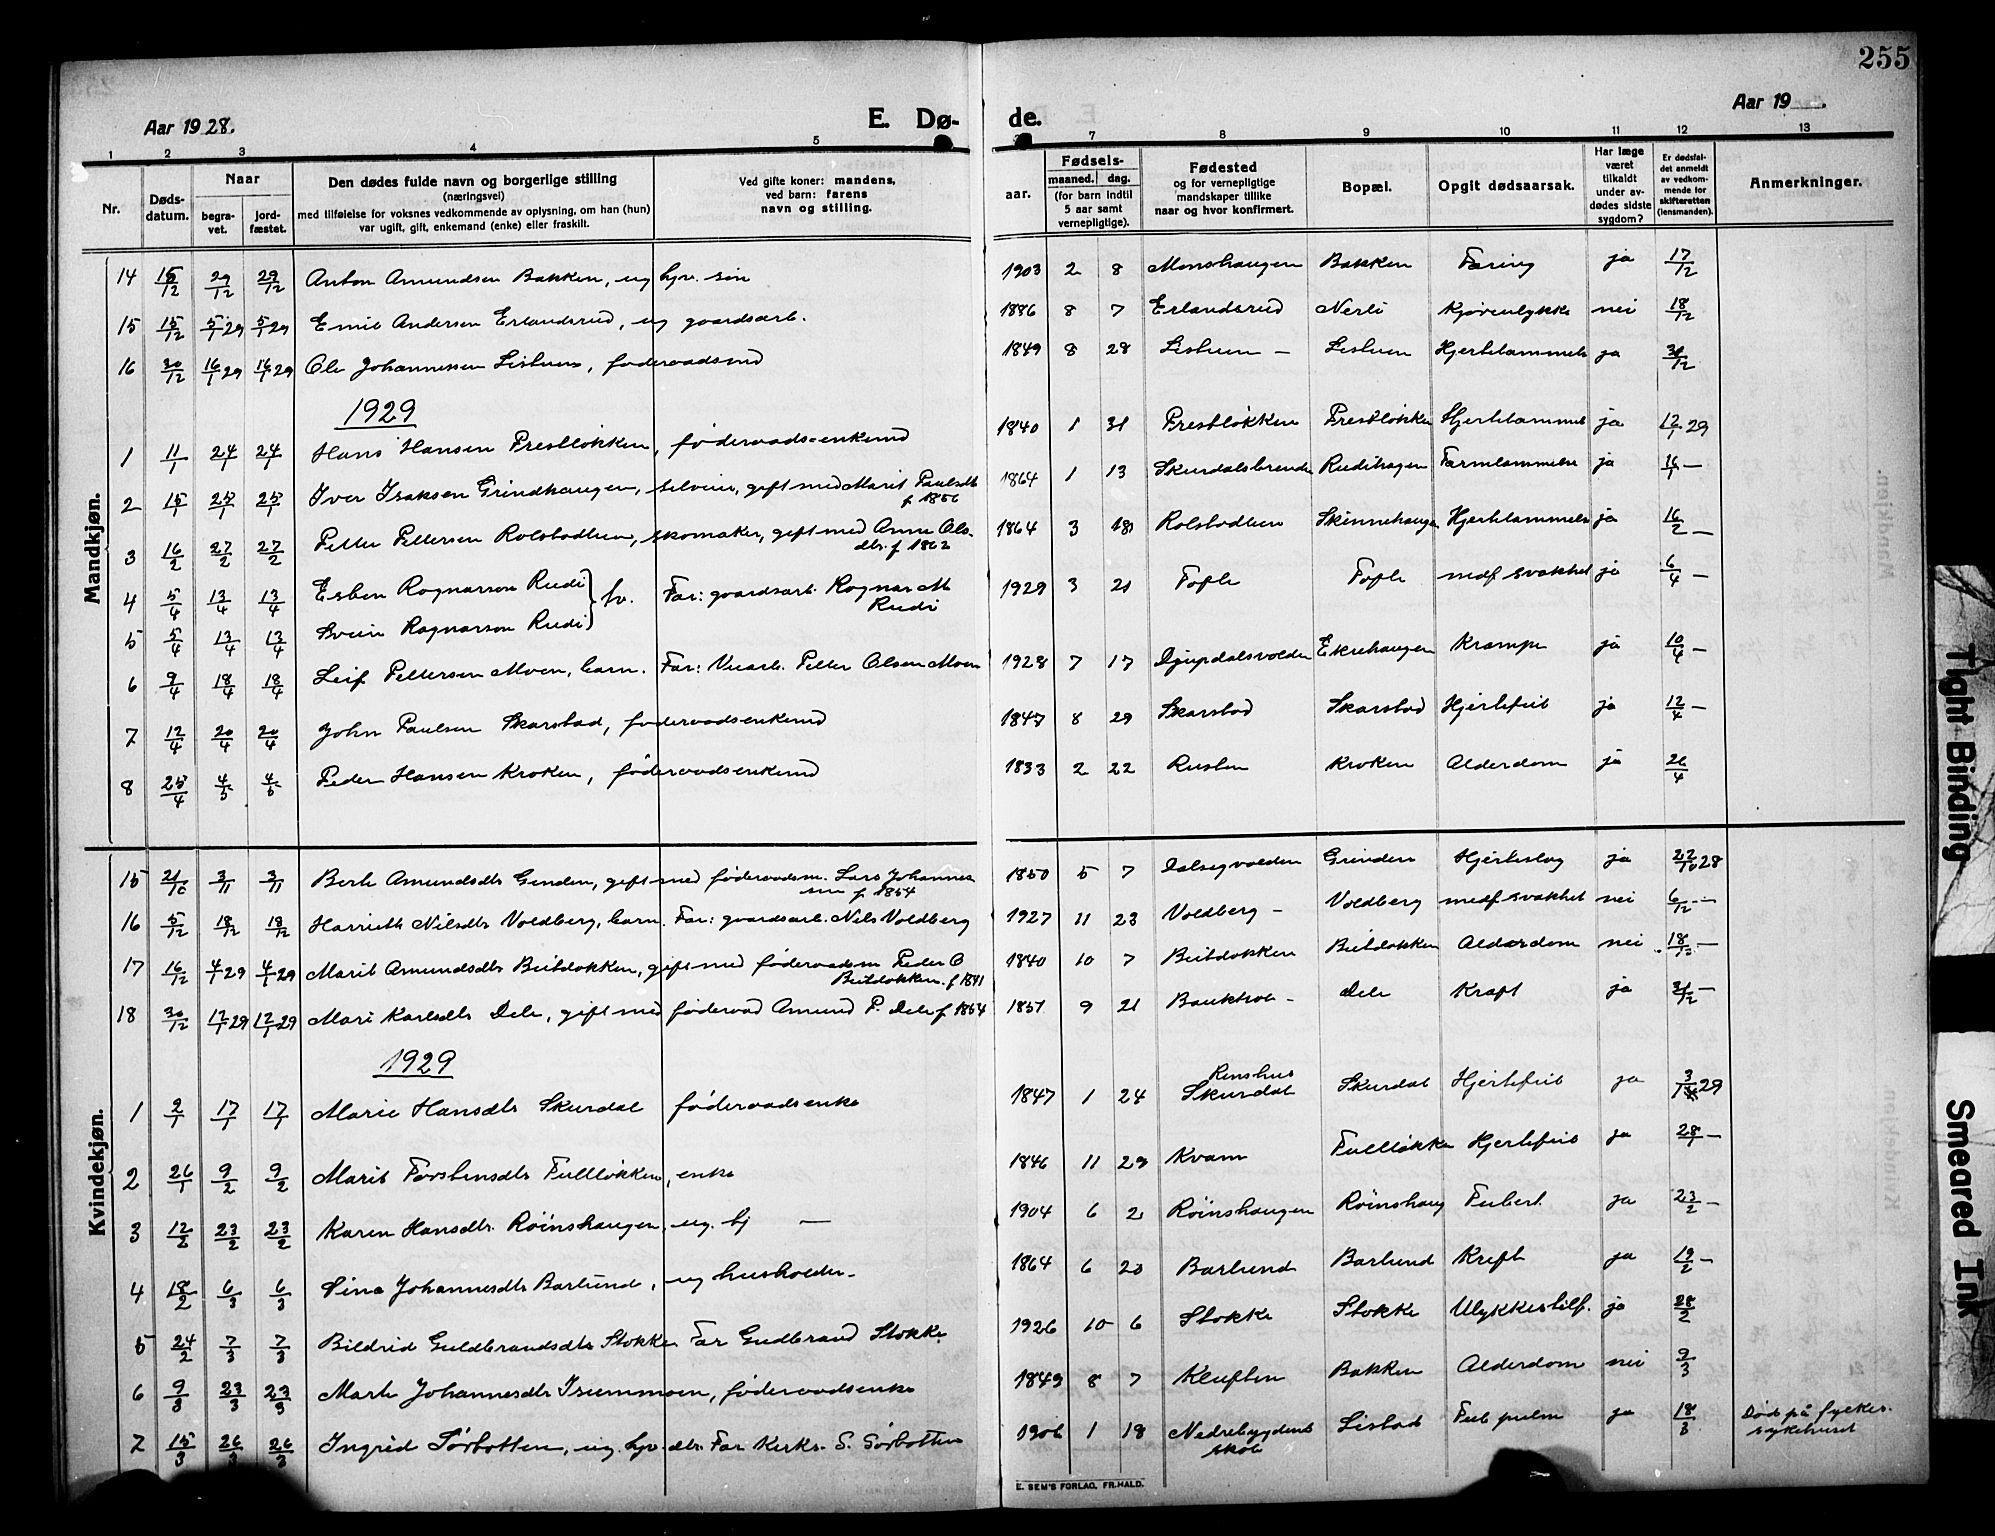 SAH, Sør-Fron prestekontor, H/Ha/Hab/L0005: Klokkerbok nr. 5, 1912-1930, s. 255